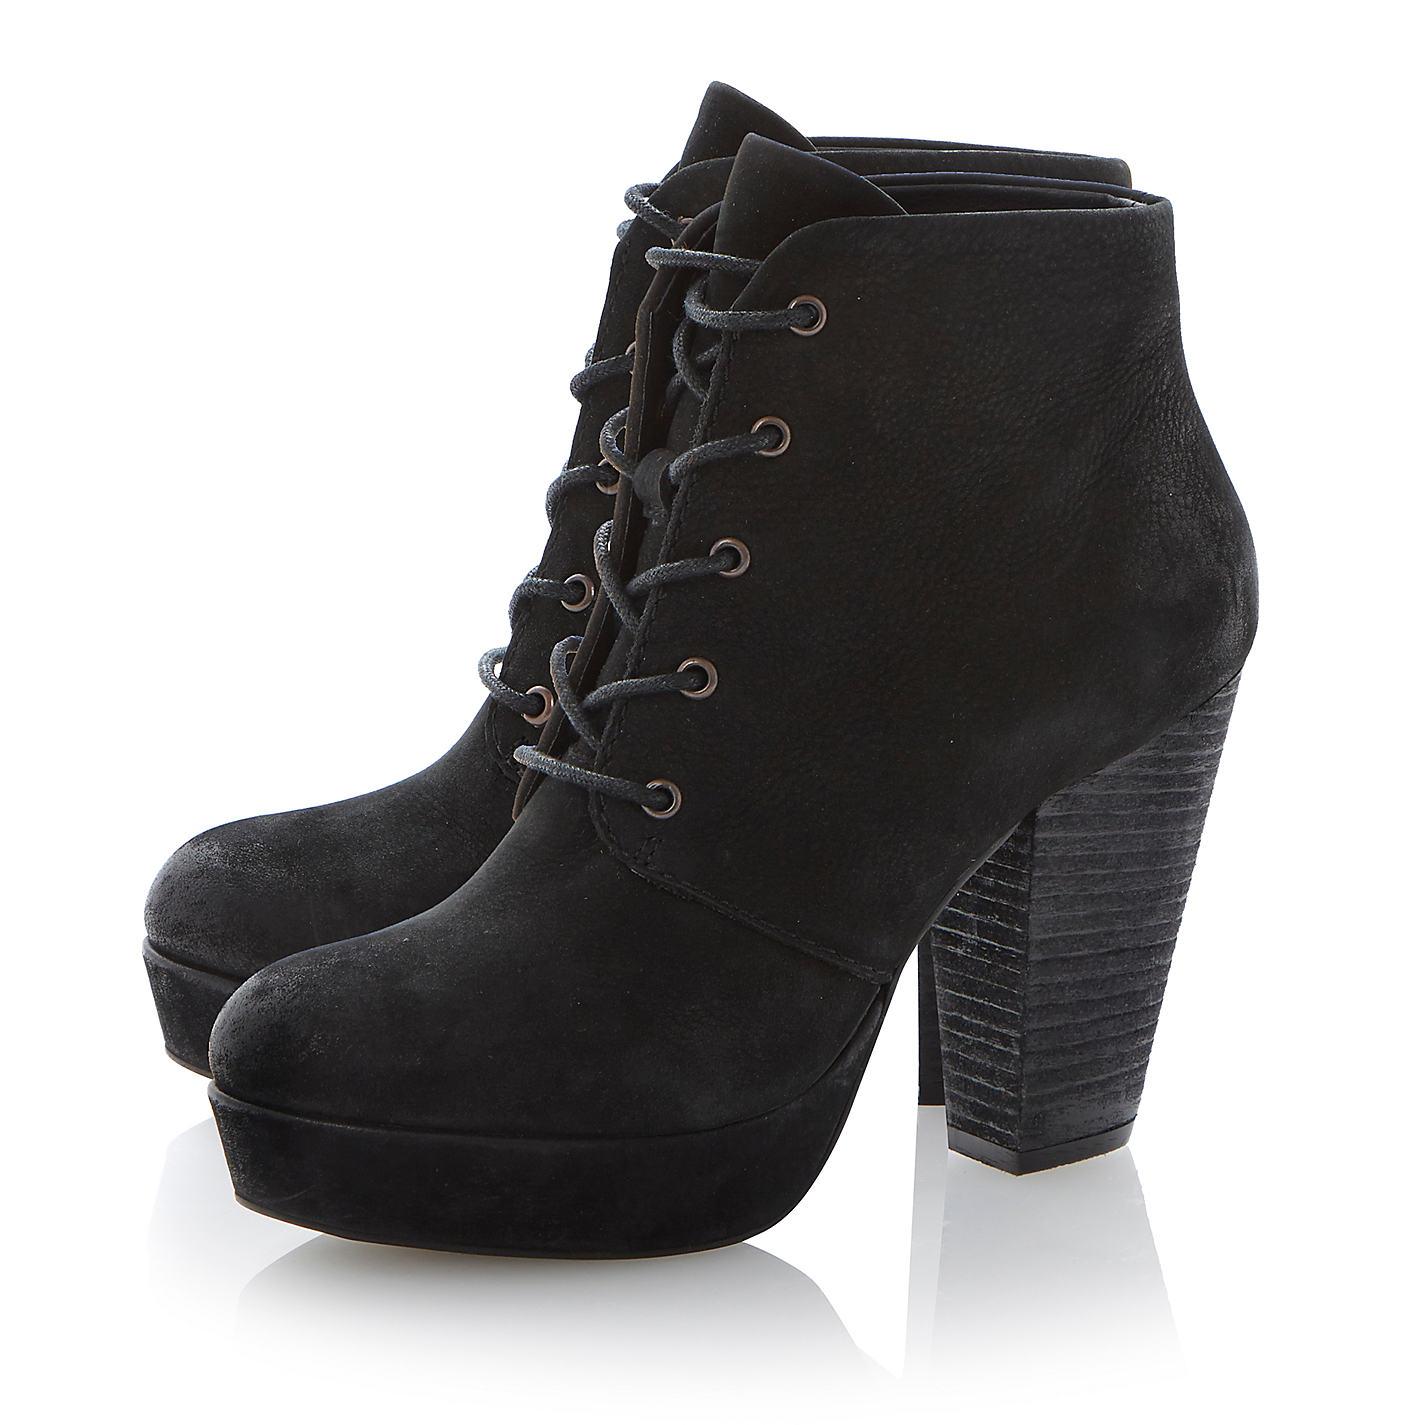 Steve Madden Raspy Platform Leather Ankle Boots | John Lewis